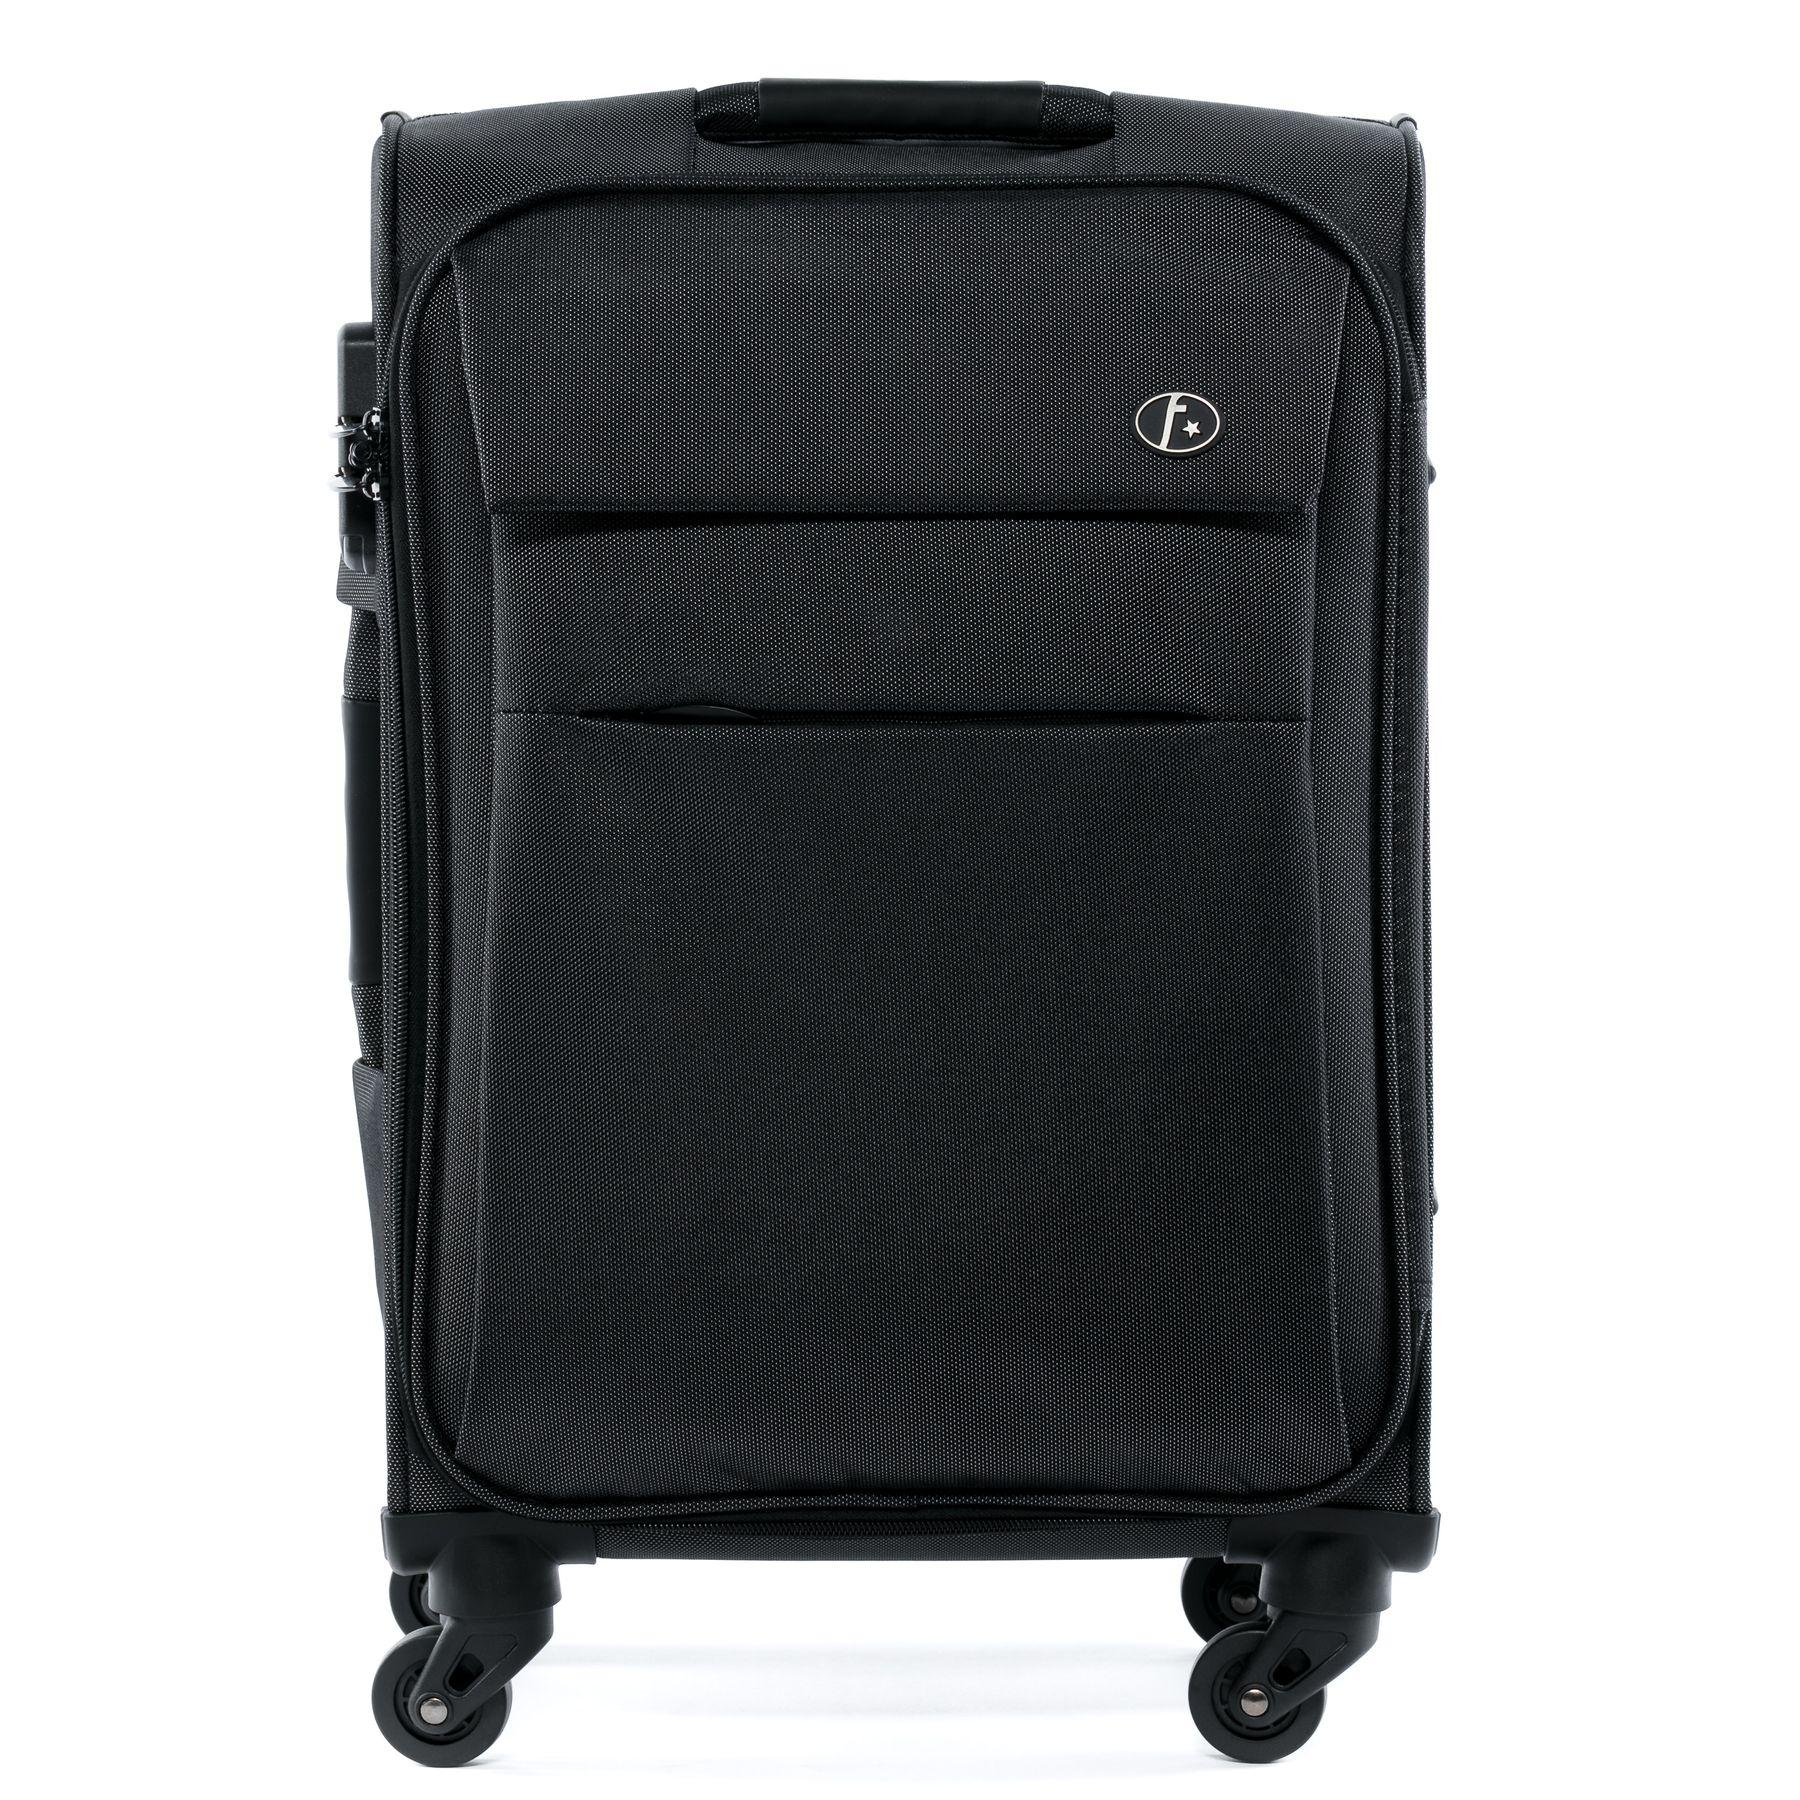 ferg 3er kofferset weichgep ck reise stoff koffer trolley. Black Bedroom Furniture Sets. Home Design Ideas